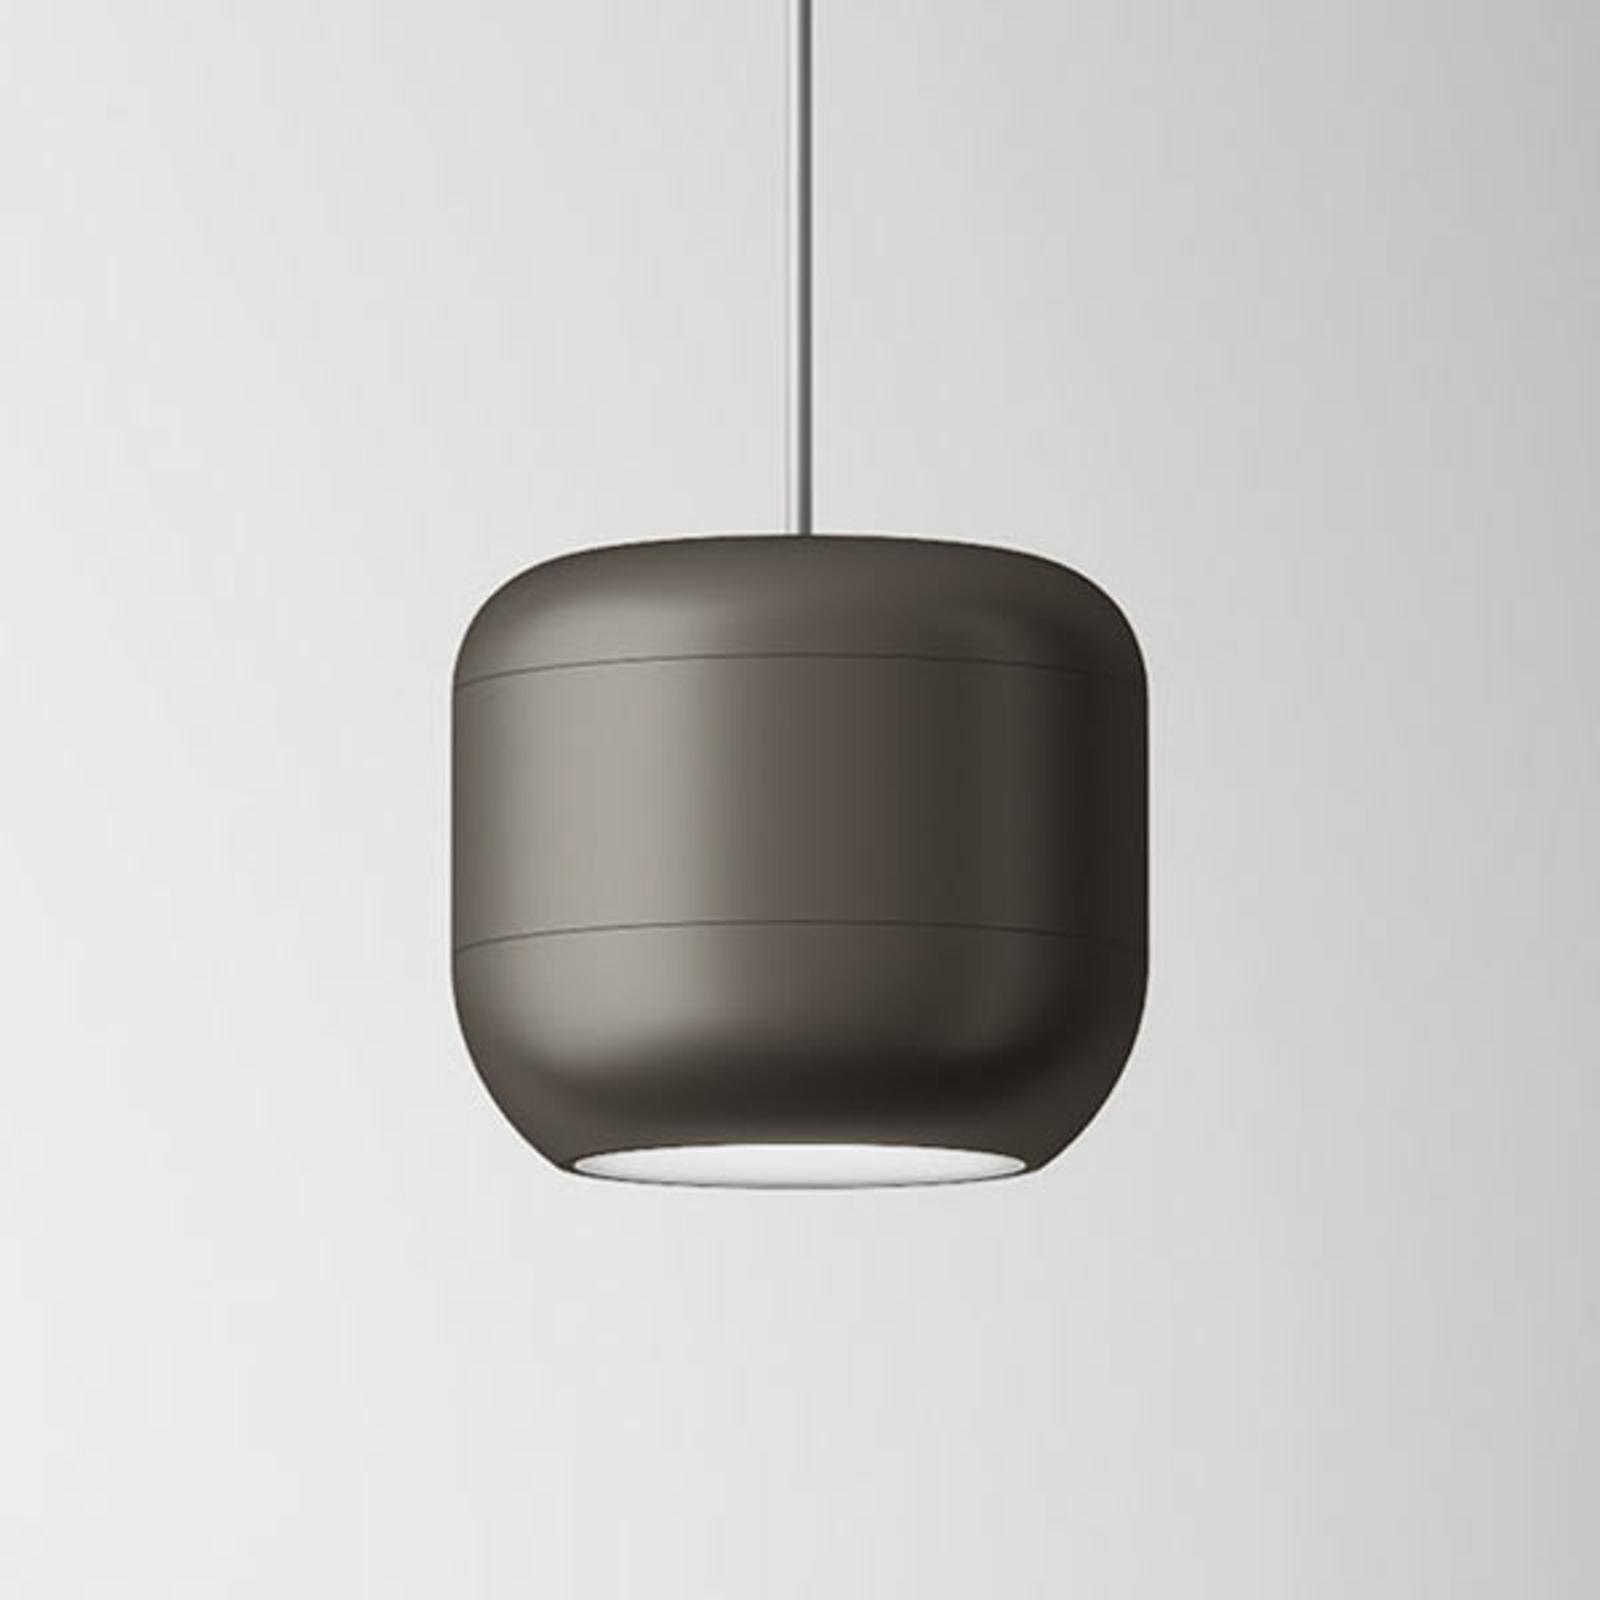 Axolight Urban lampa wisząca LED 16 cm nikiel